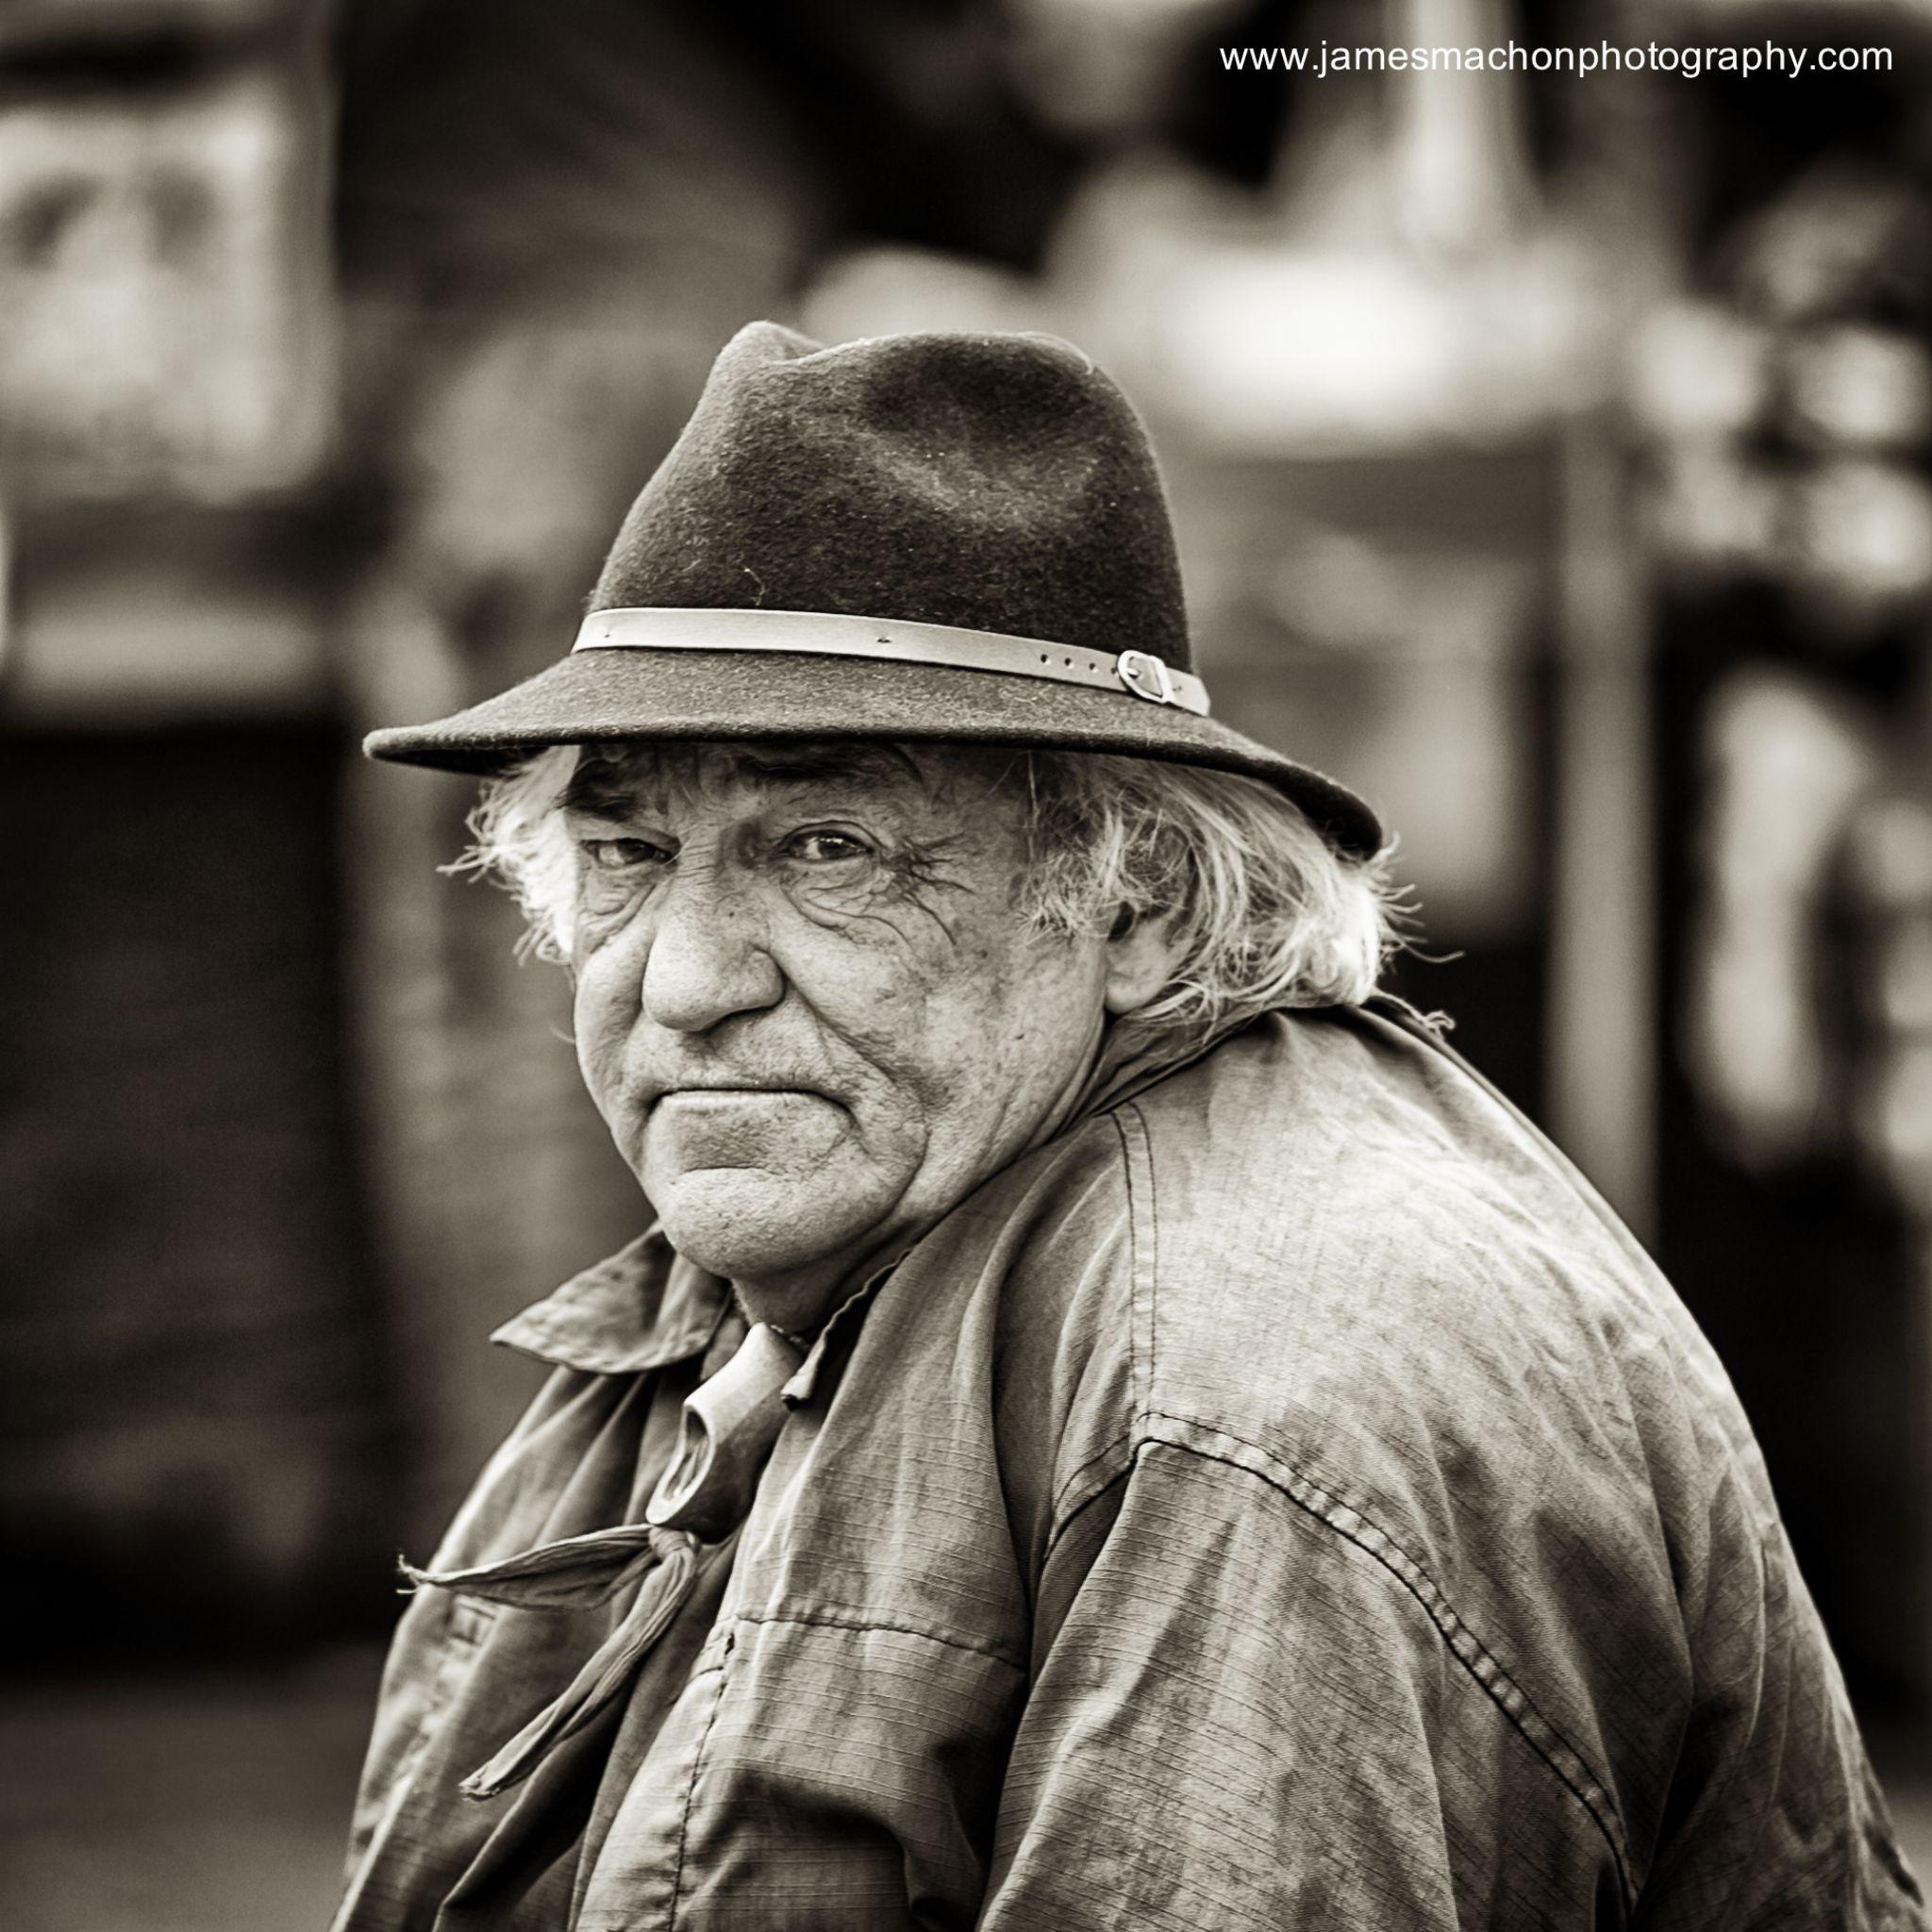 Market Trader by James Machon Photography